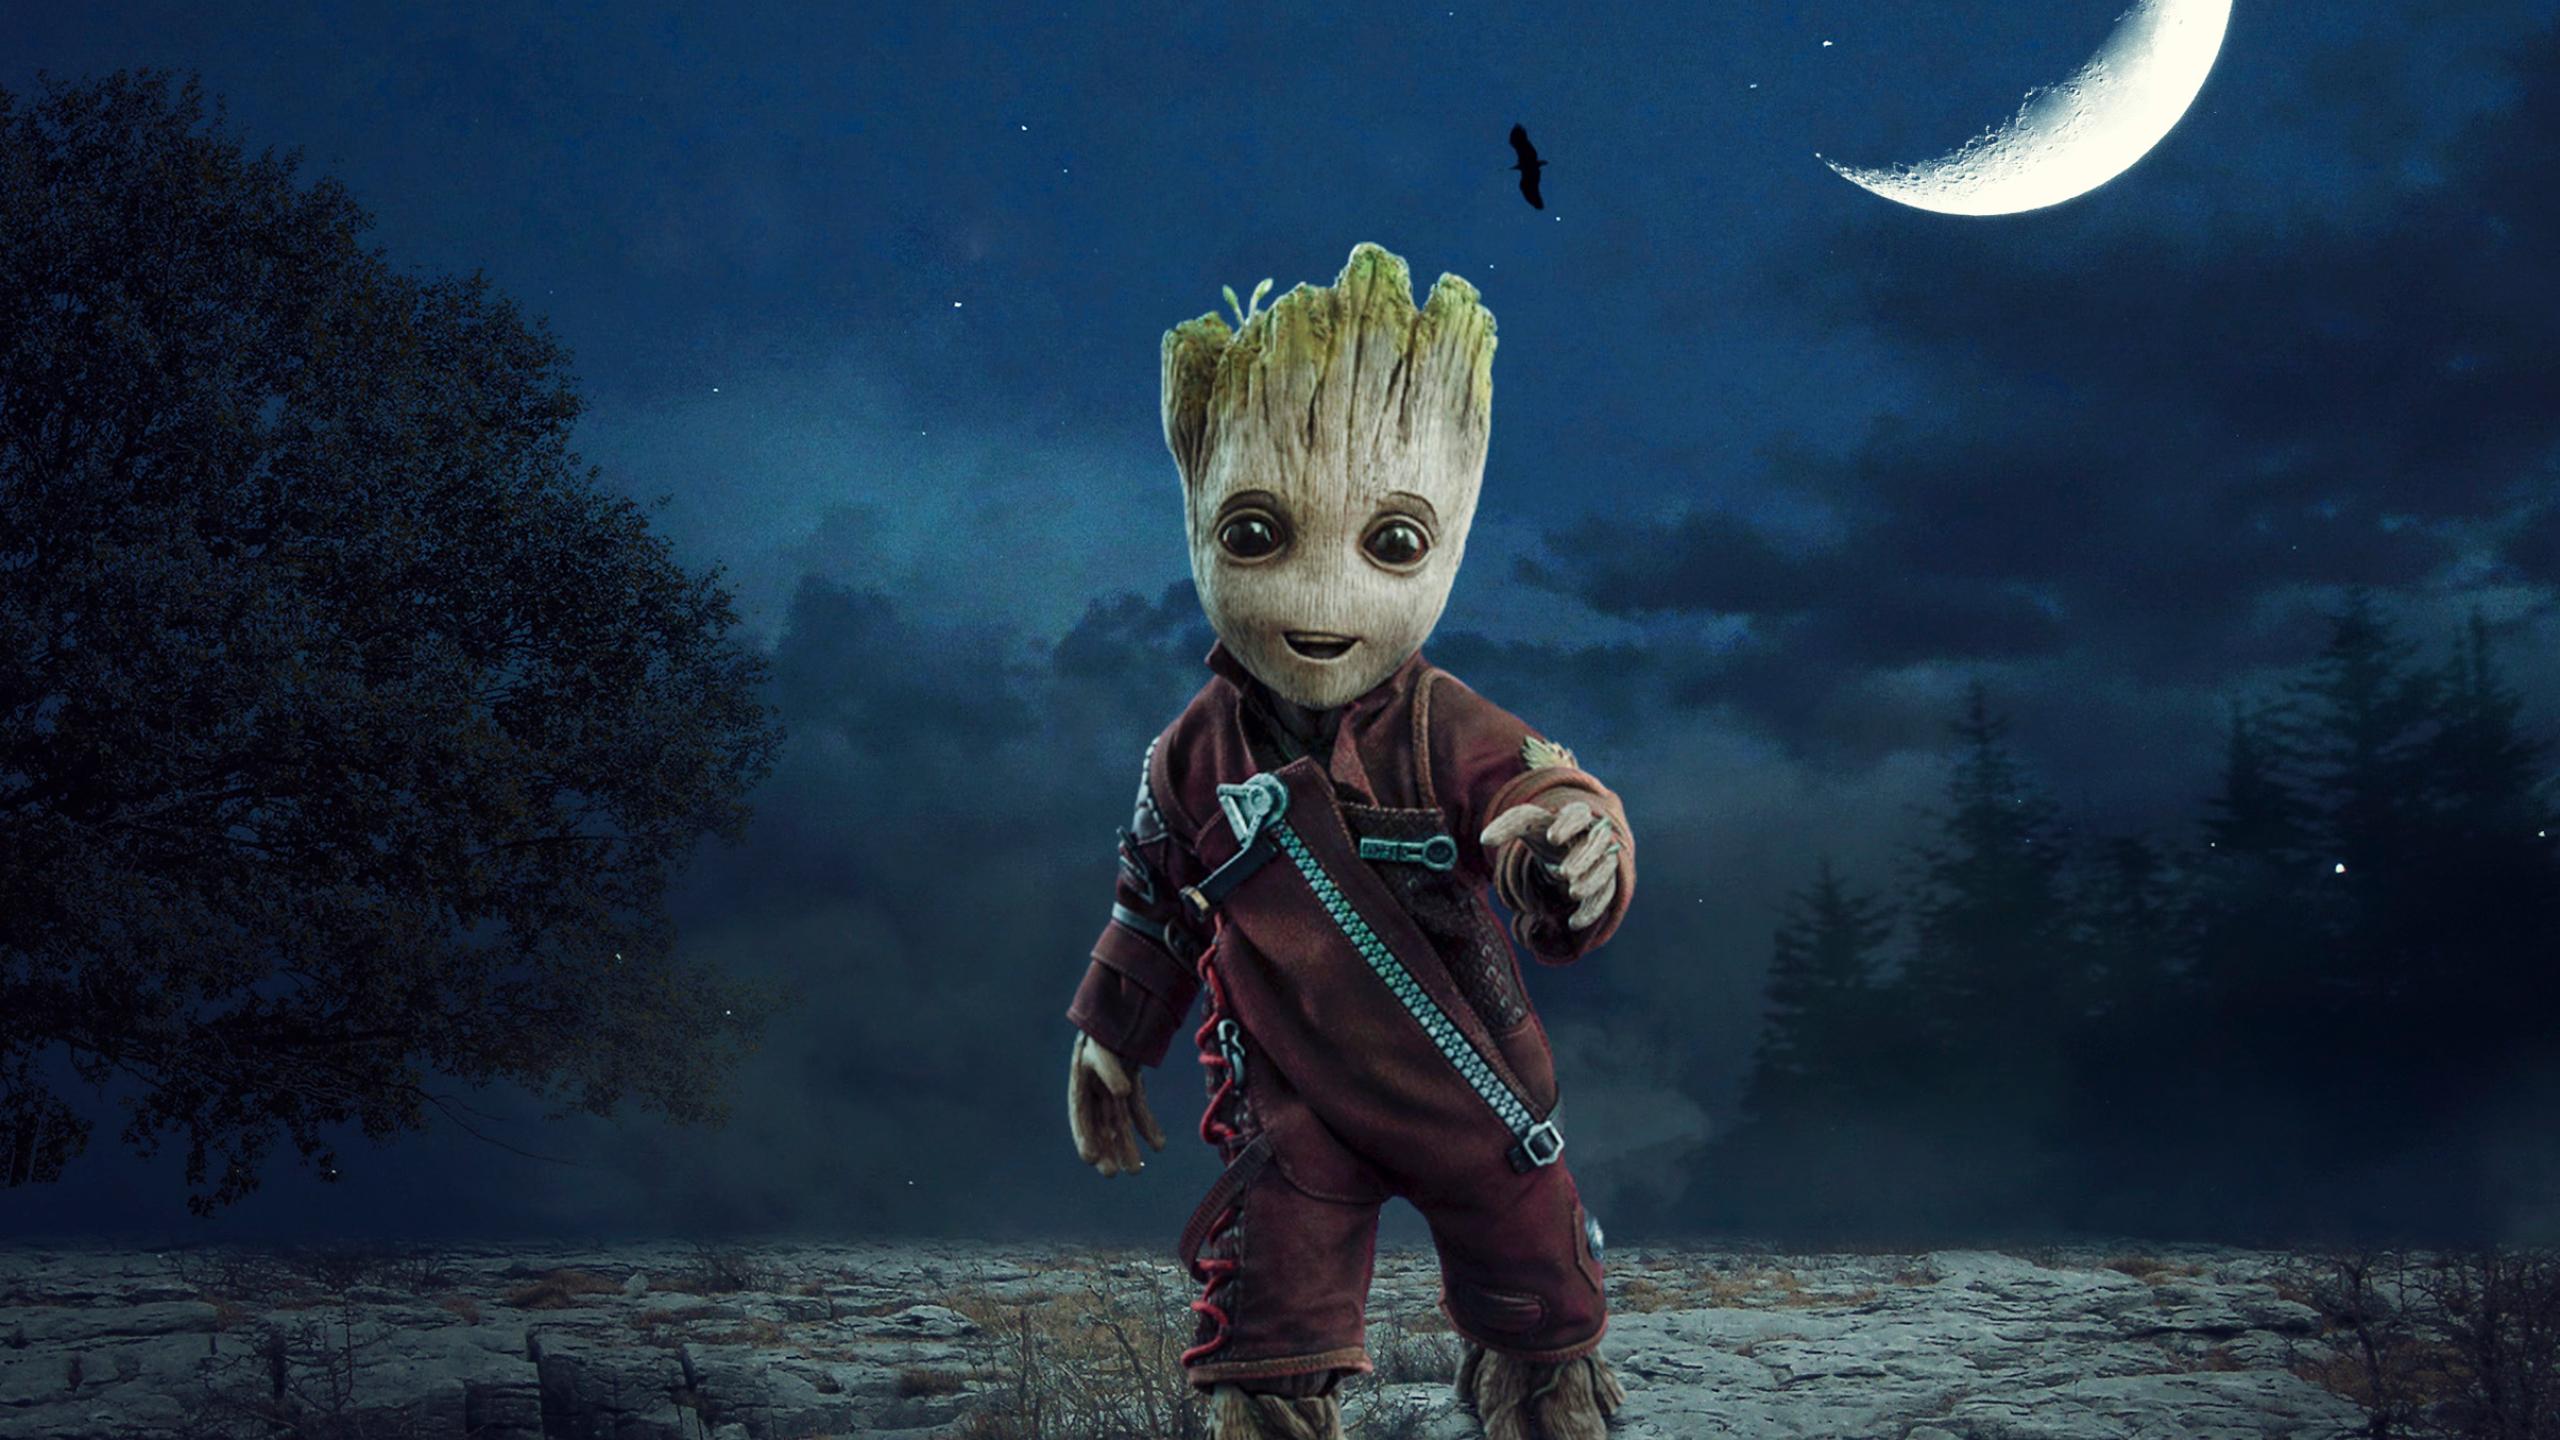 2560x1440 Baby Groot 1440p Resolution Wallpaper Hd Artist